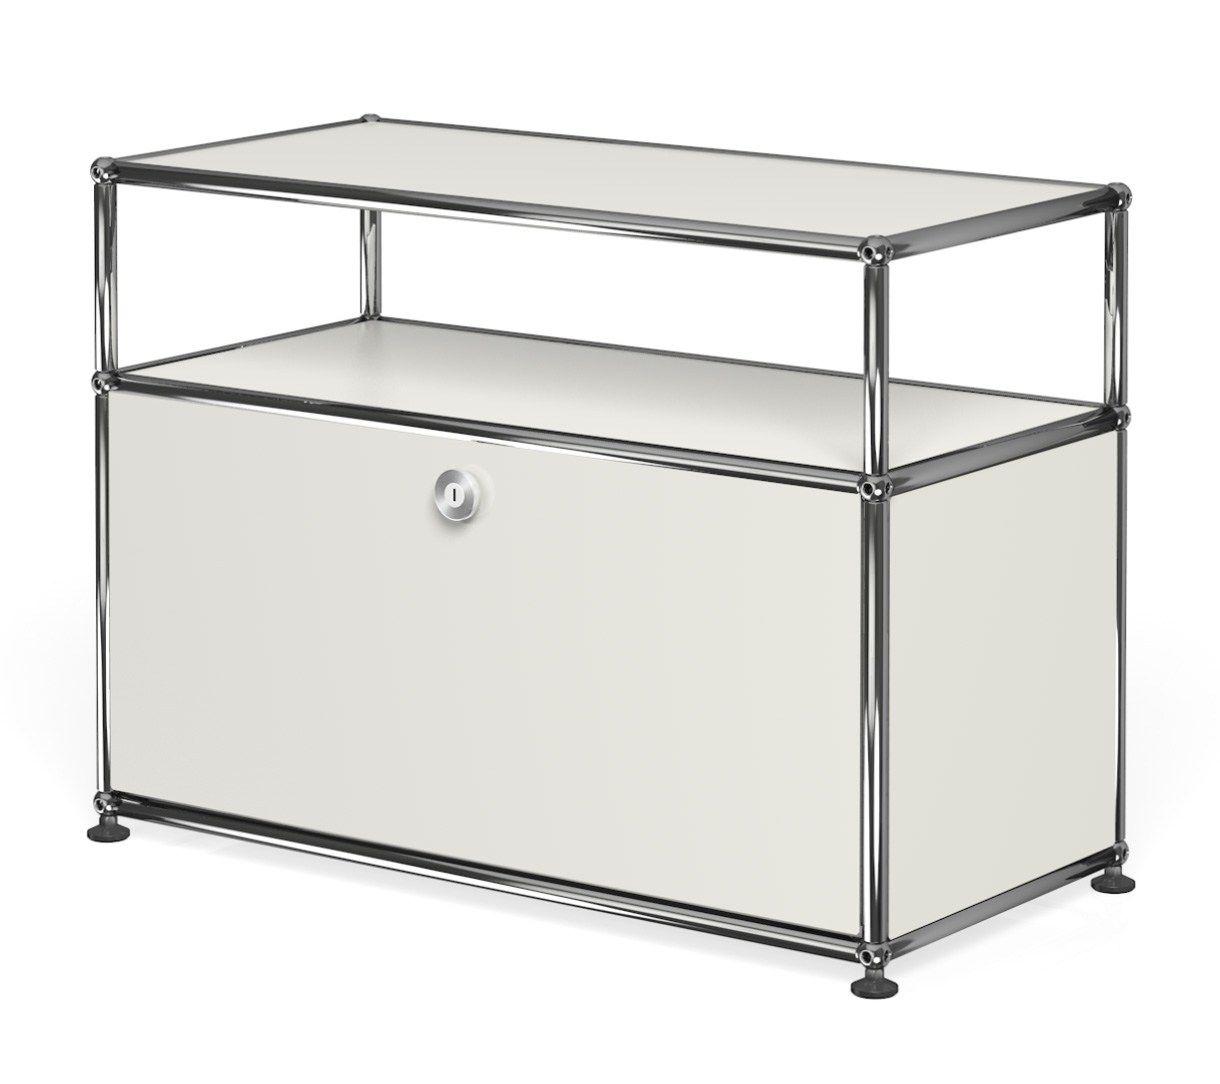 Usm haller media cabinet meuble tv by usm modular for Meuble tv usm